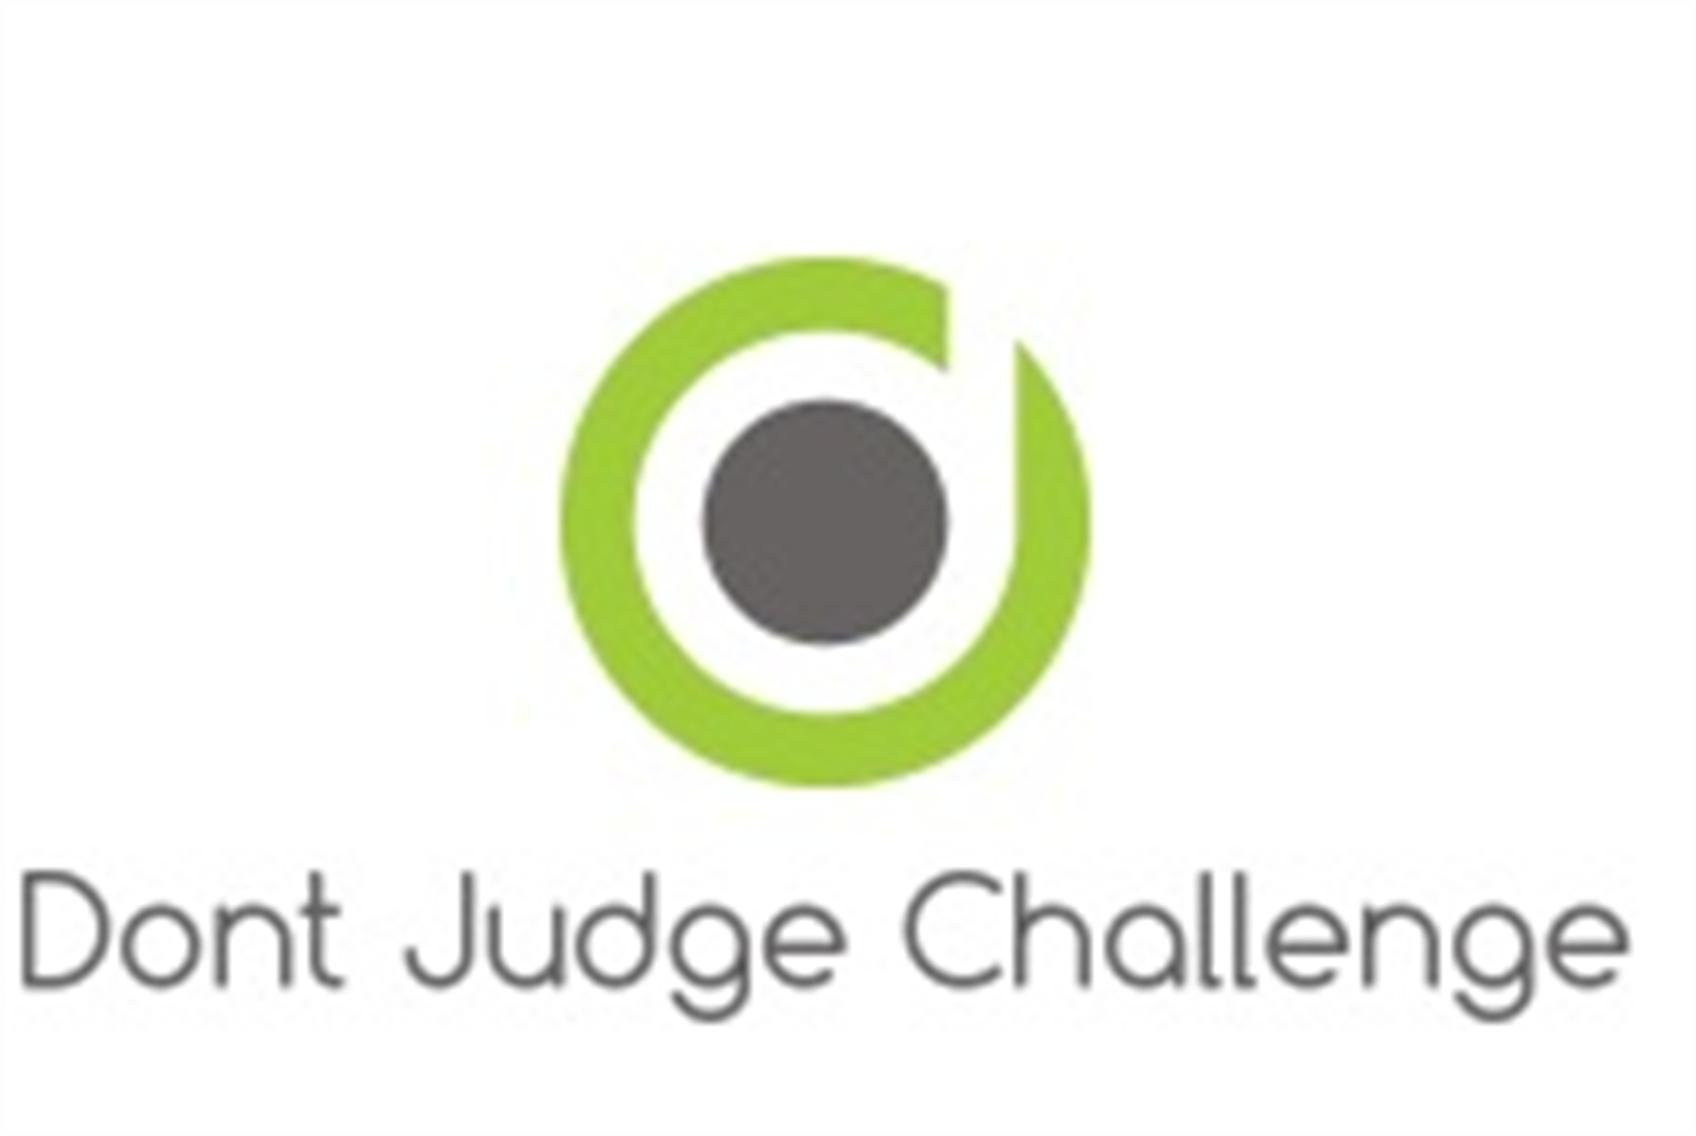 Dont Judge Challenge